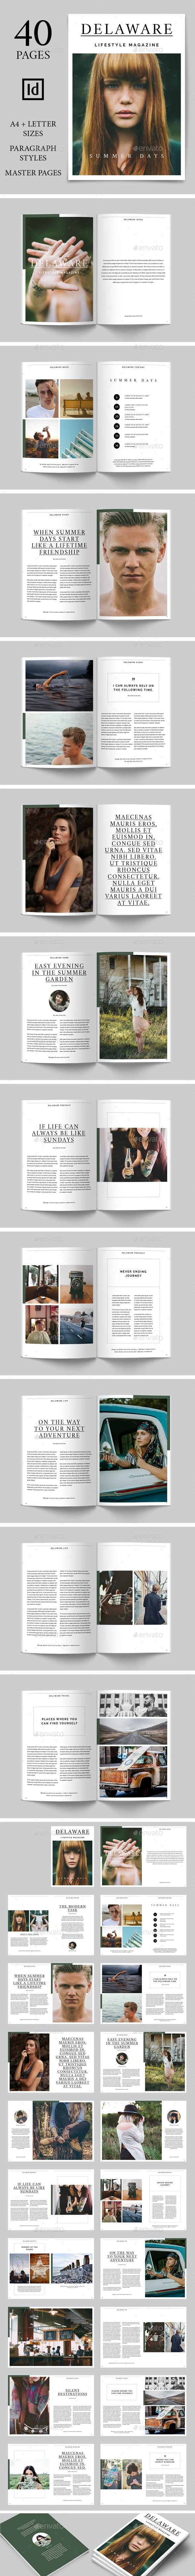 Delaware Lifestyle Magazine - Magazines Print Templates